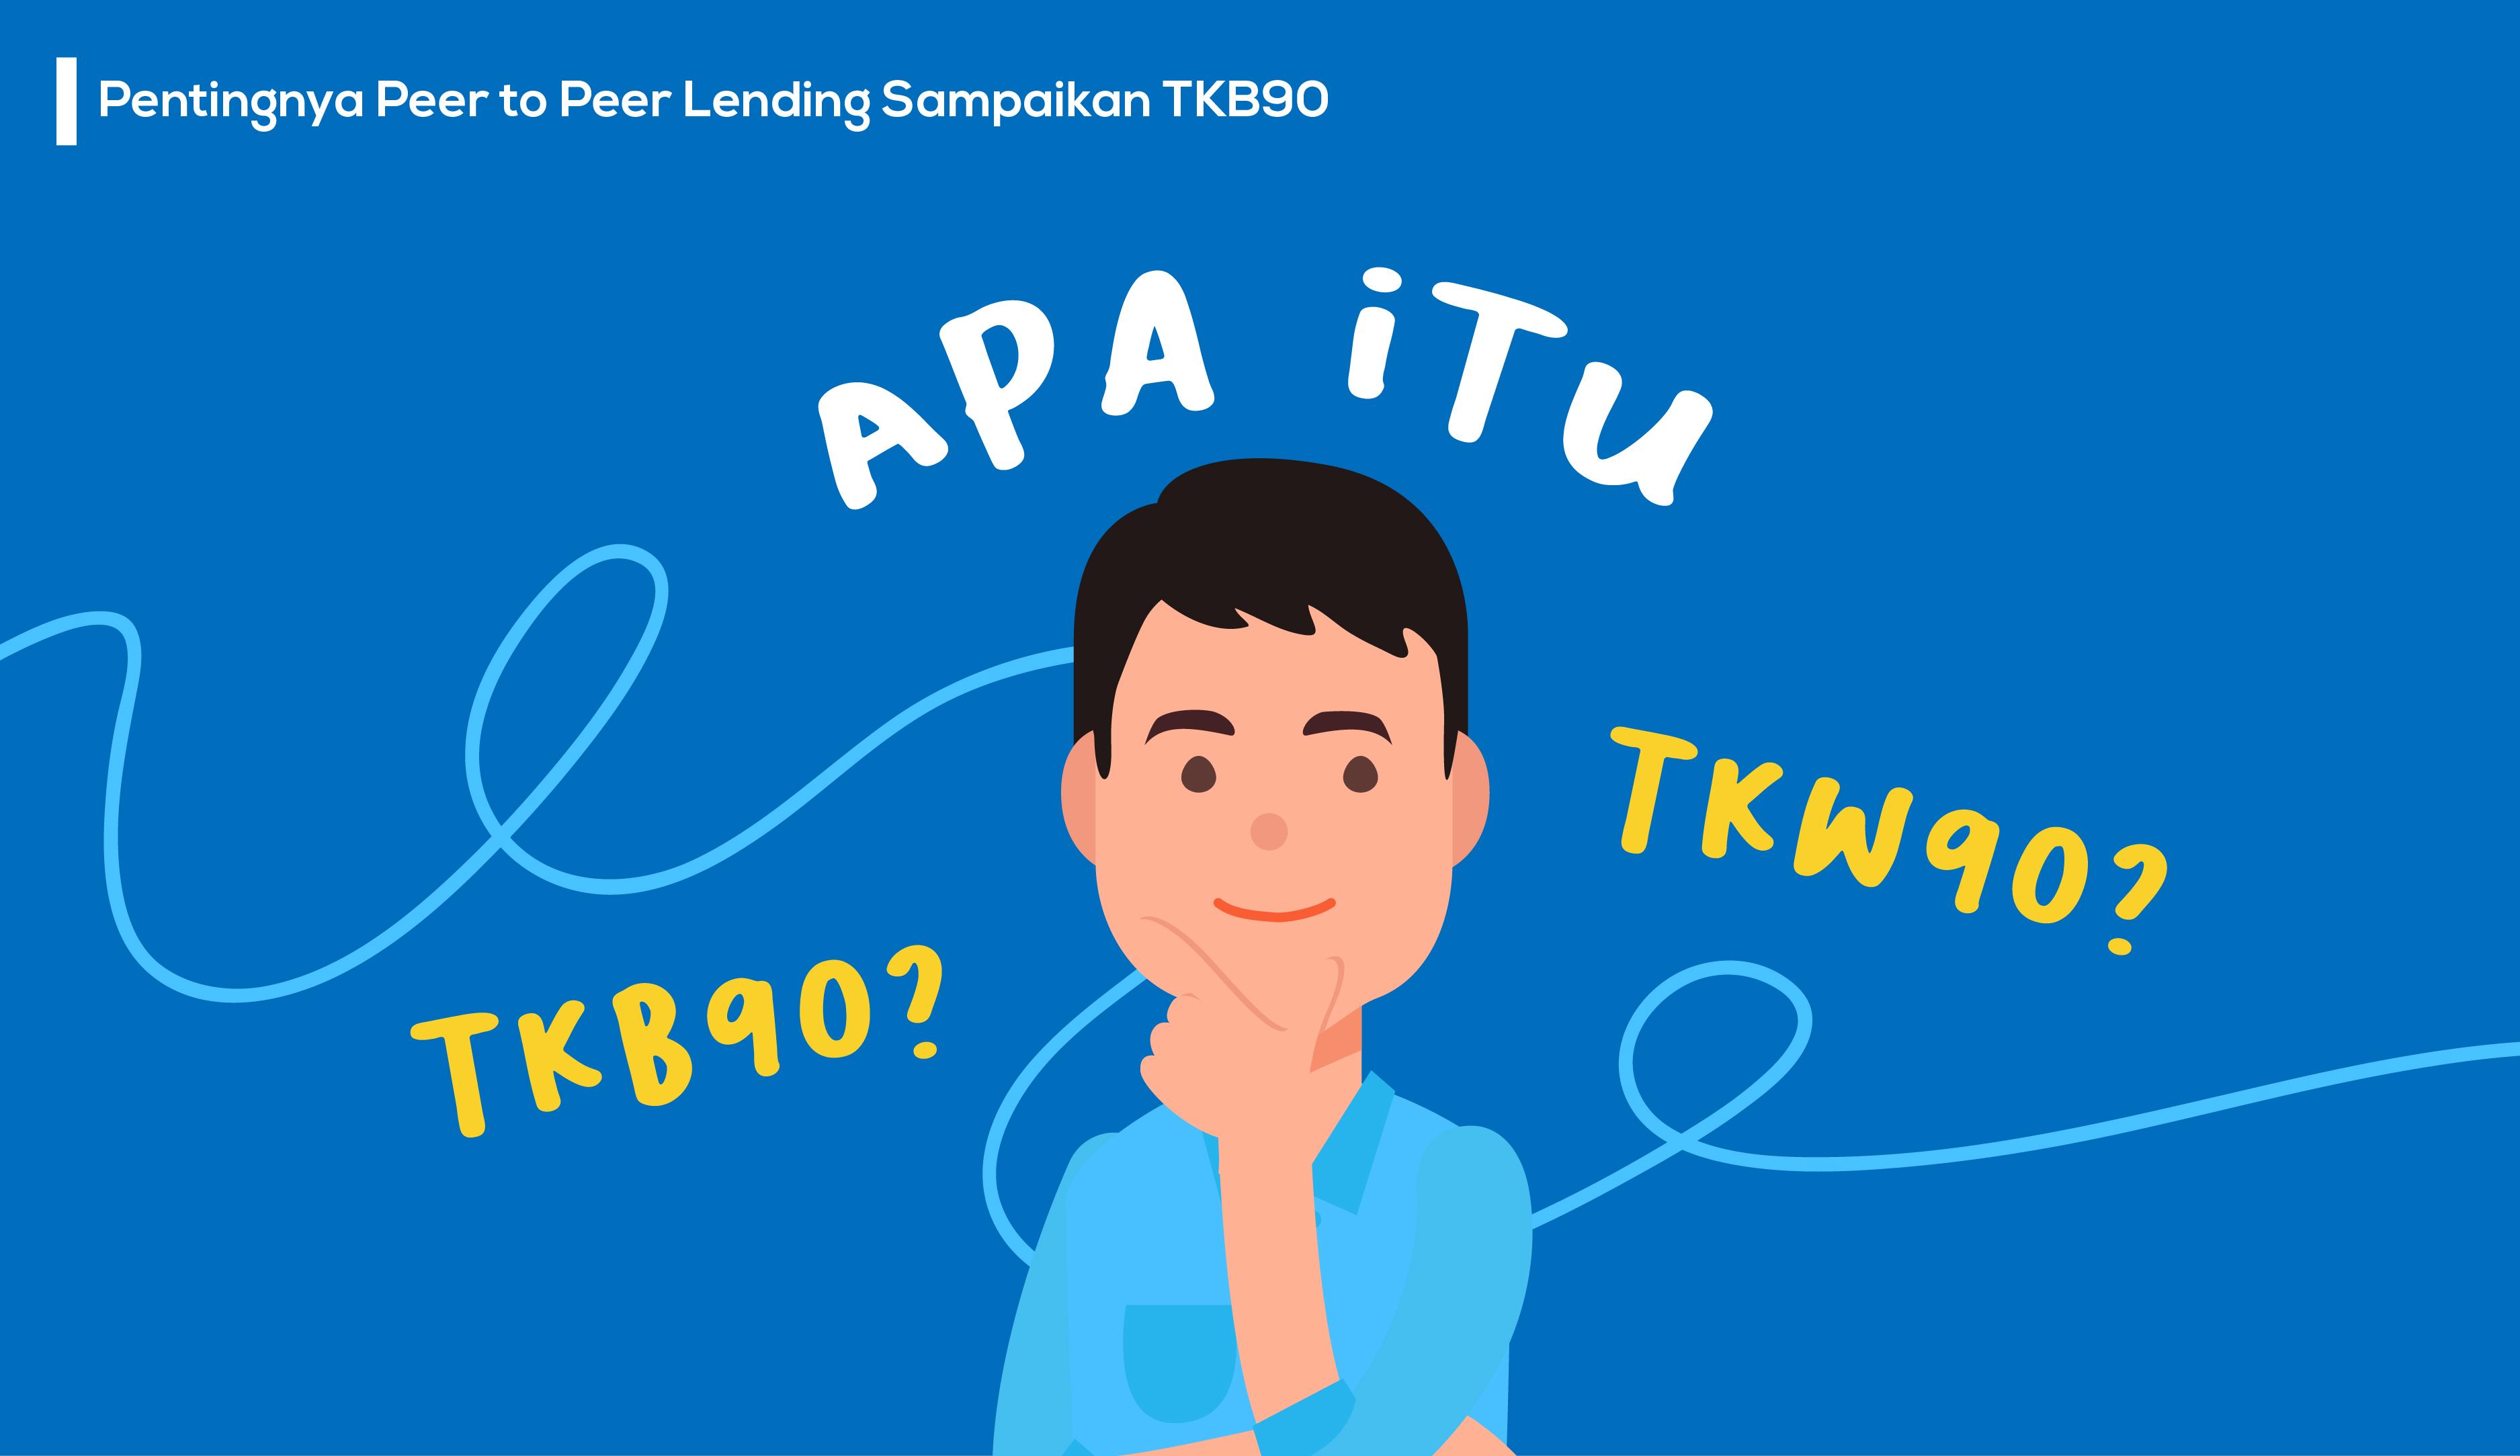 Pentingnya peer to peer lending menyampaikan TKB90